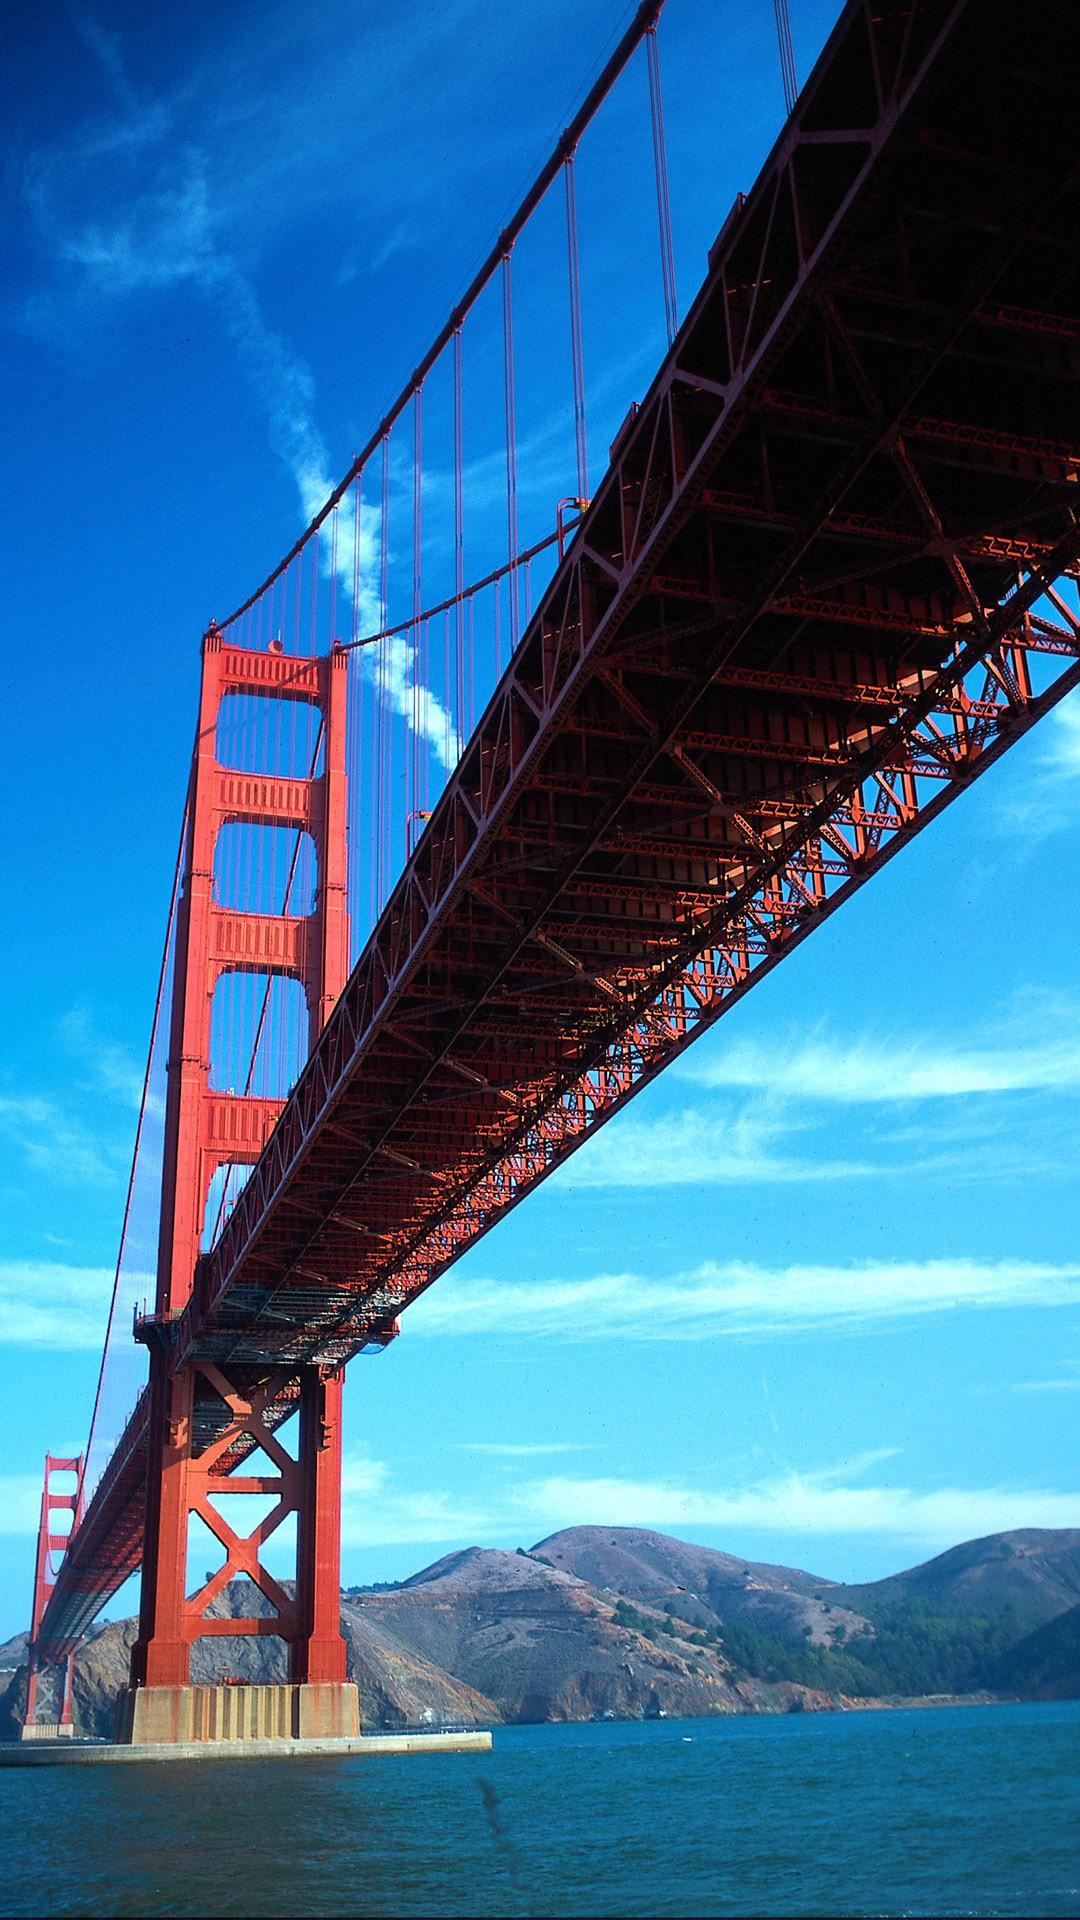 Htc One M8 Wallpaper Hd Golden Gate Bridge World Best Htc One Wallpapers